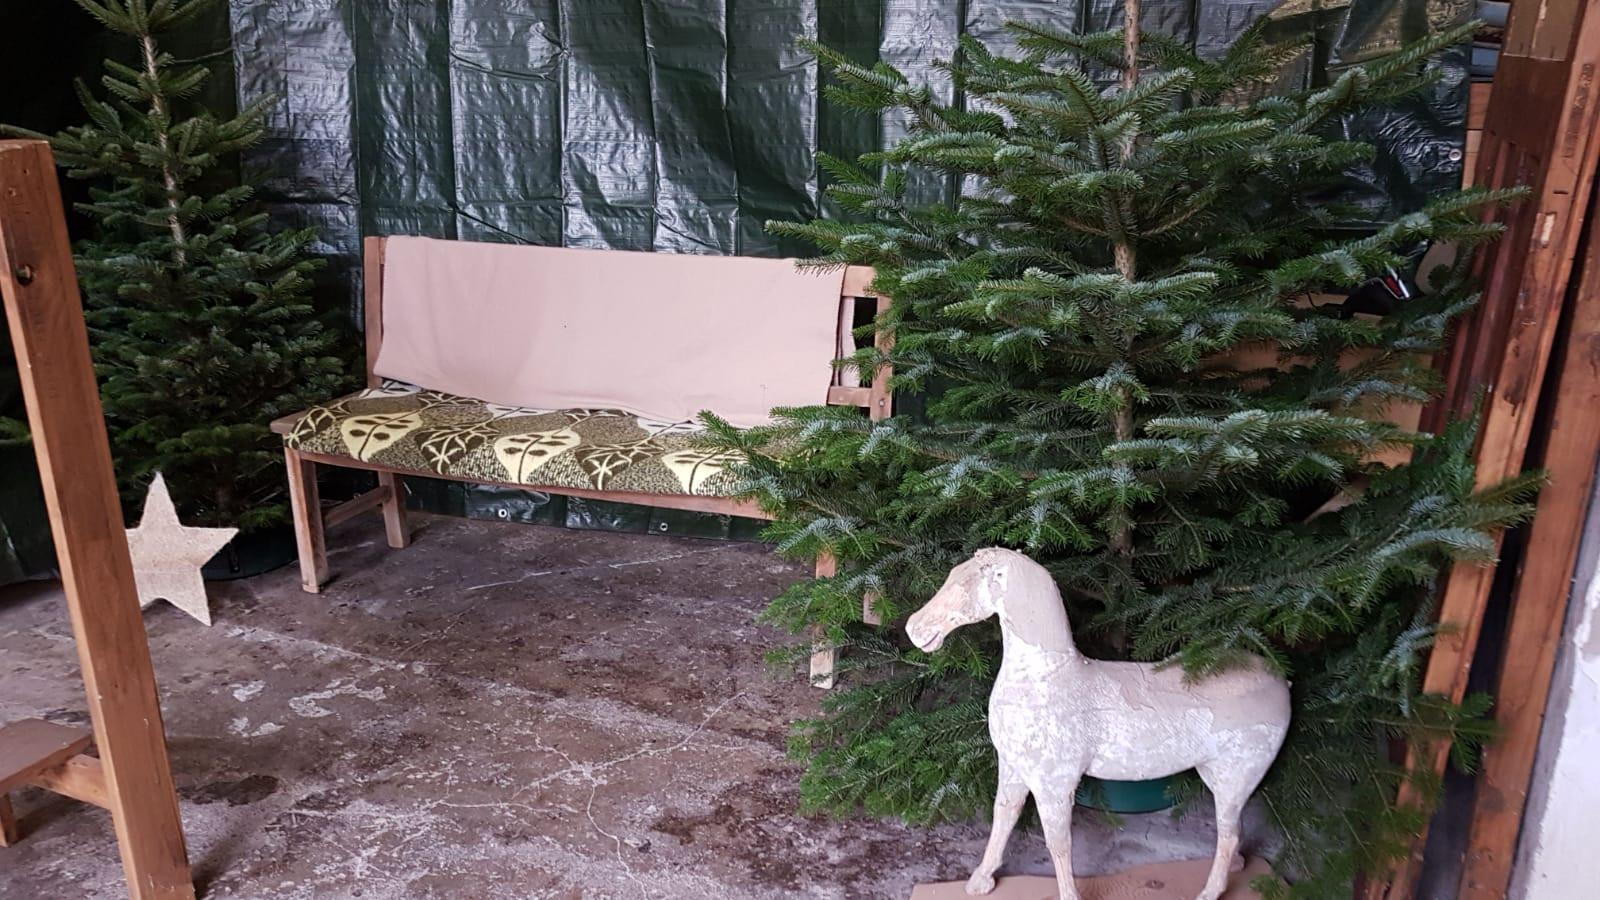 Kottenheimer Weihnachtswandern